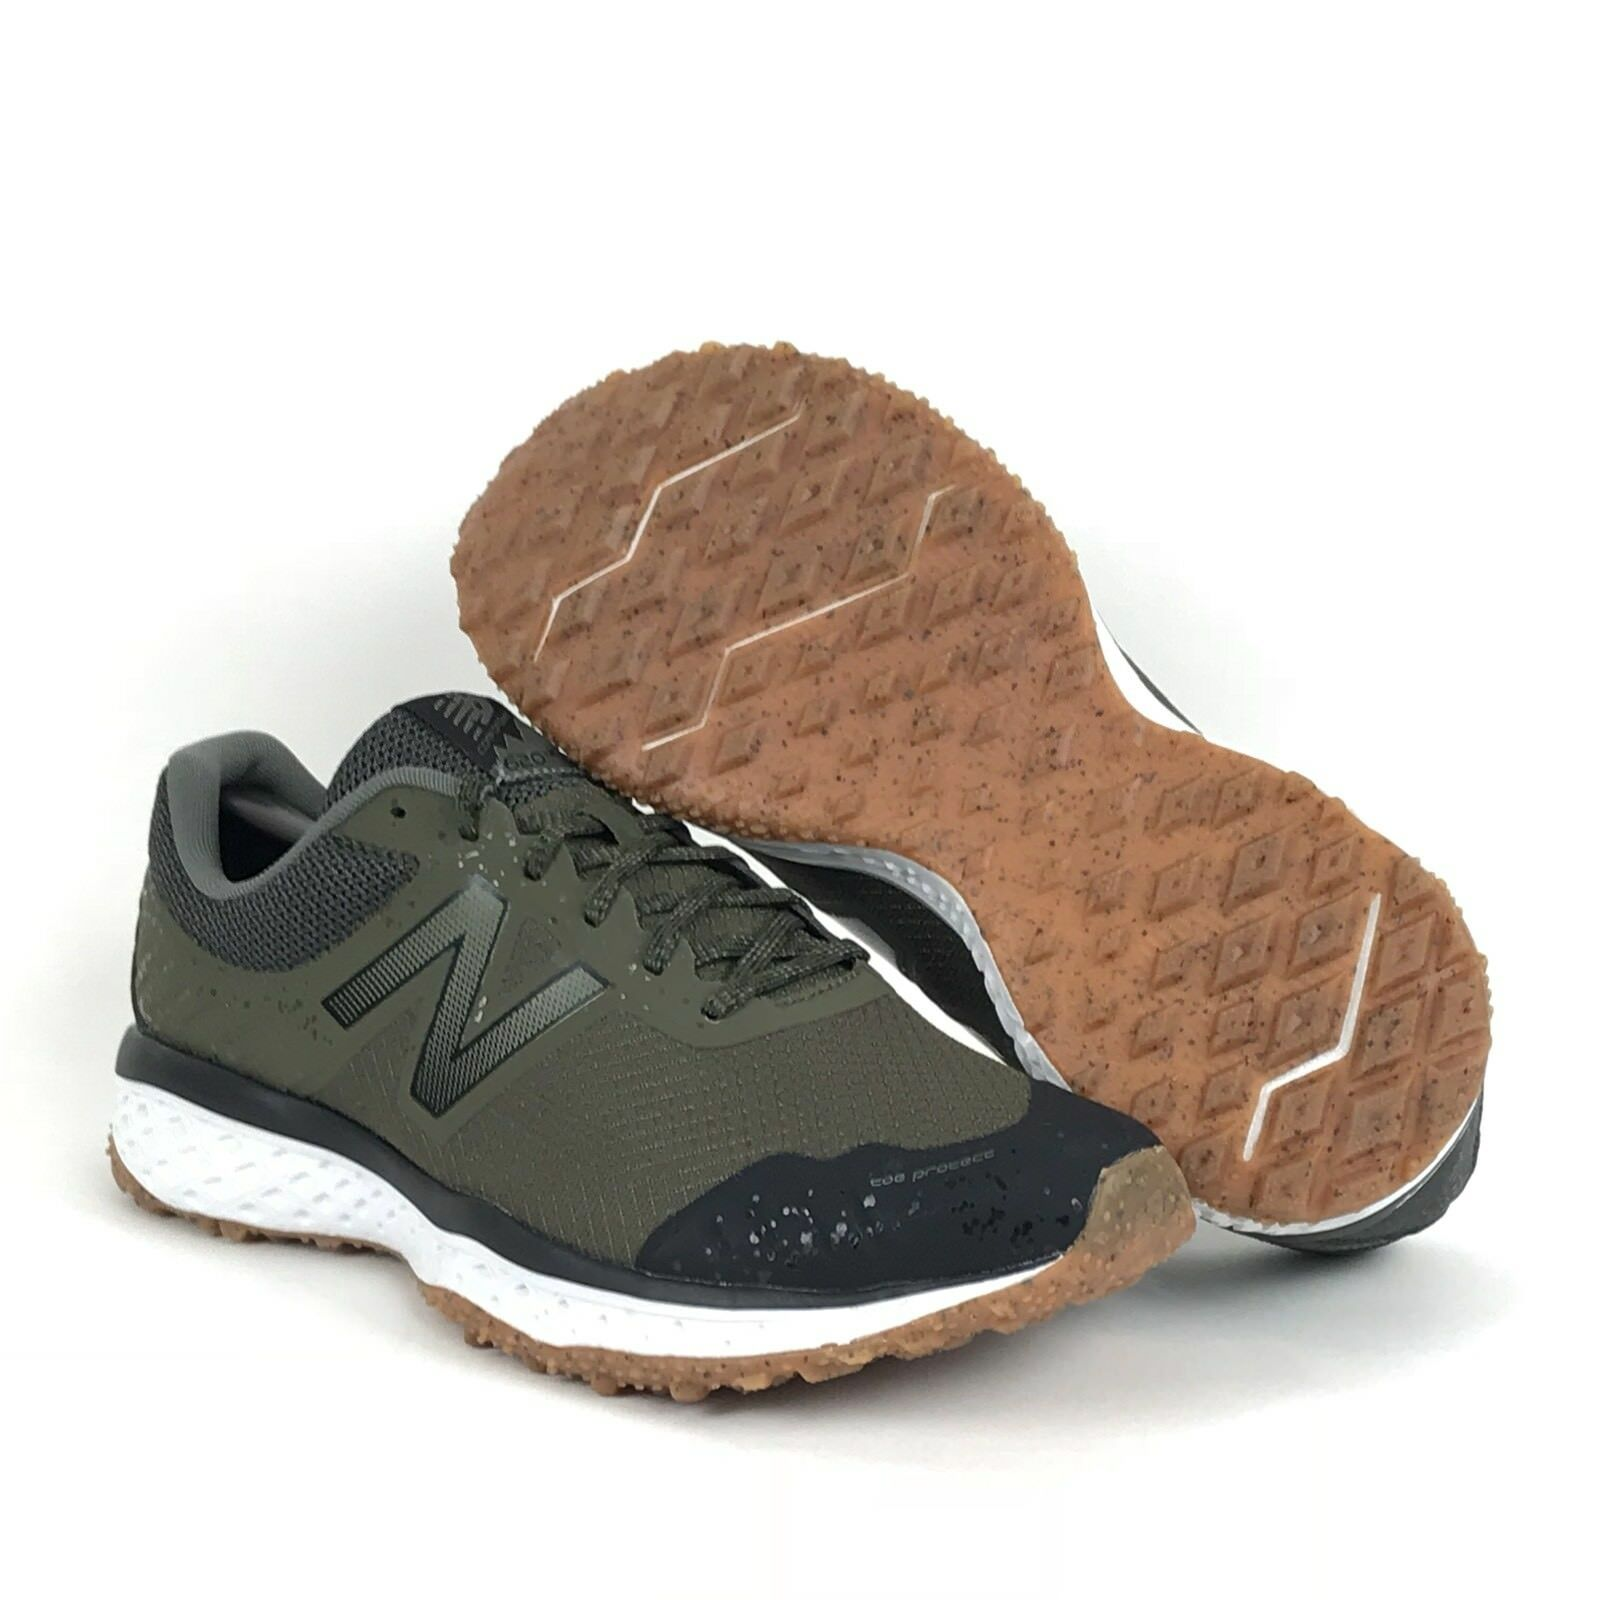 New Balance Mens 620v2 Military Dark Triumph Green 4E Trail Running Shoe Size 10